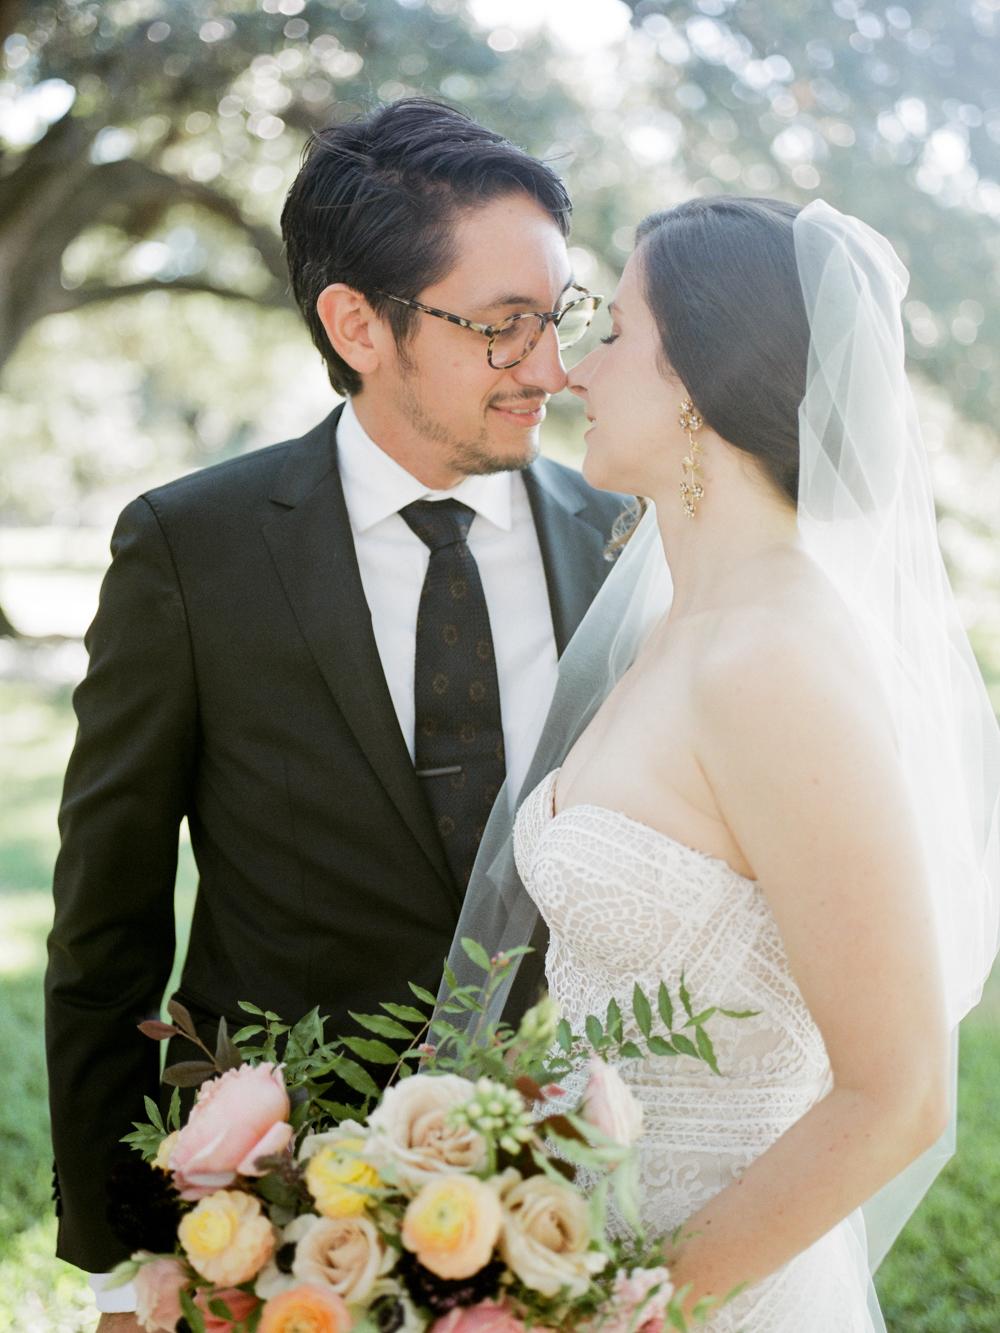 fall wedding at rothko chapel- houston wedding photographer-christine gosch - film photographer - elopement photographer- intimate wedding - lovely bride wedding gown-12.jpg